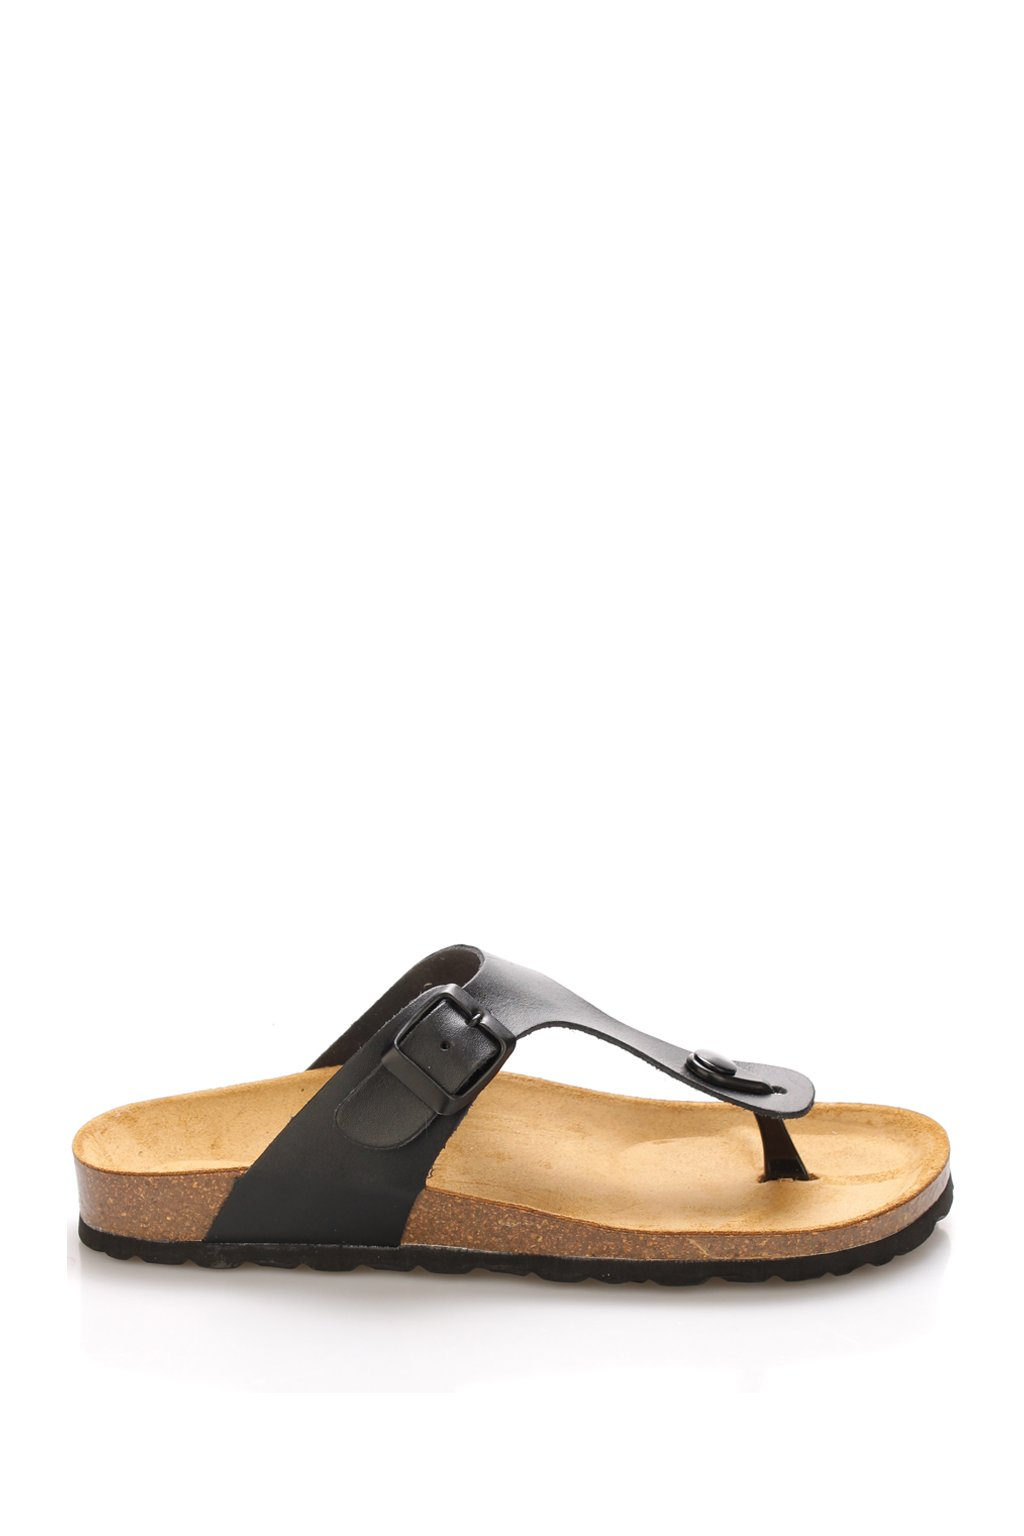 cerne kozene zdravotni pantofle emma shoes1